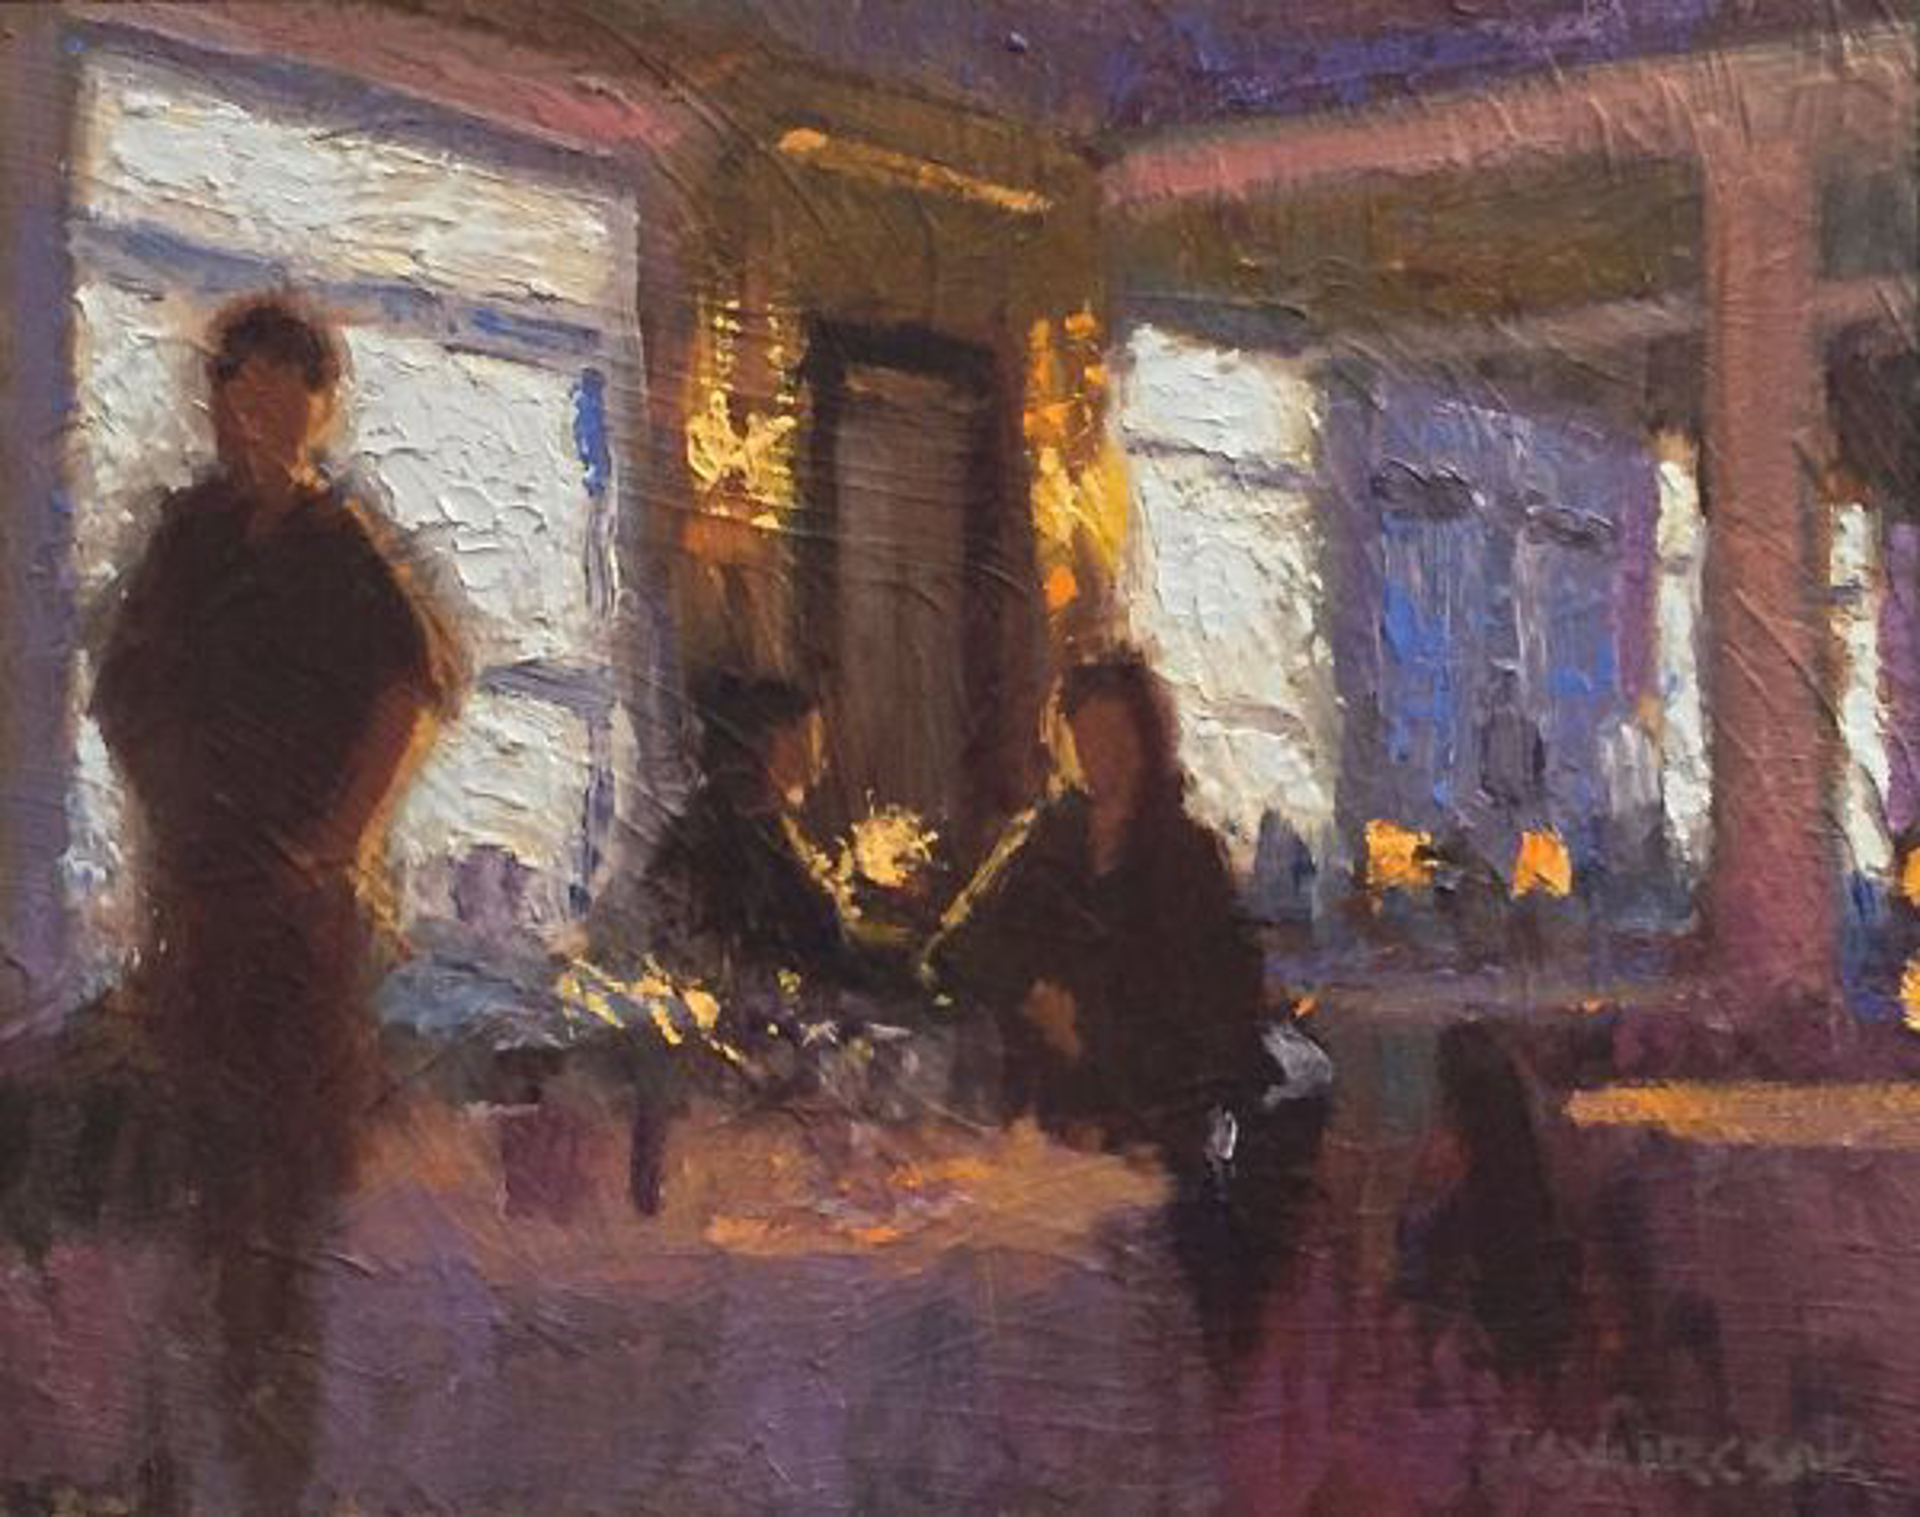 Evening Chat by Joe Gyurcsak